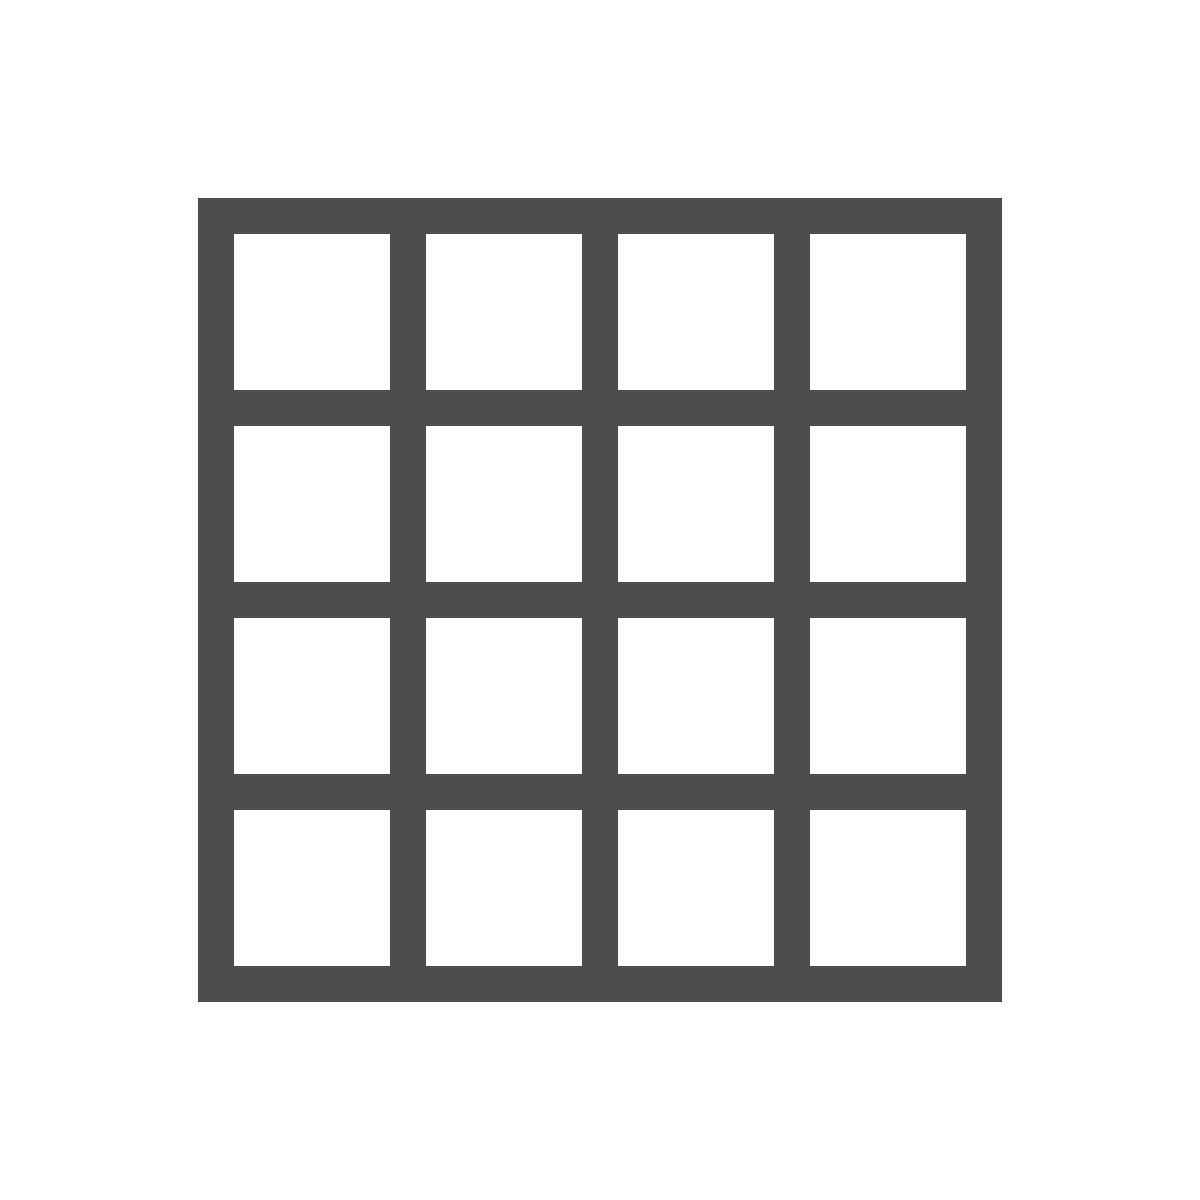 Salt Grid